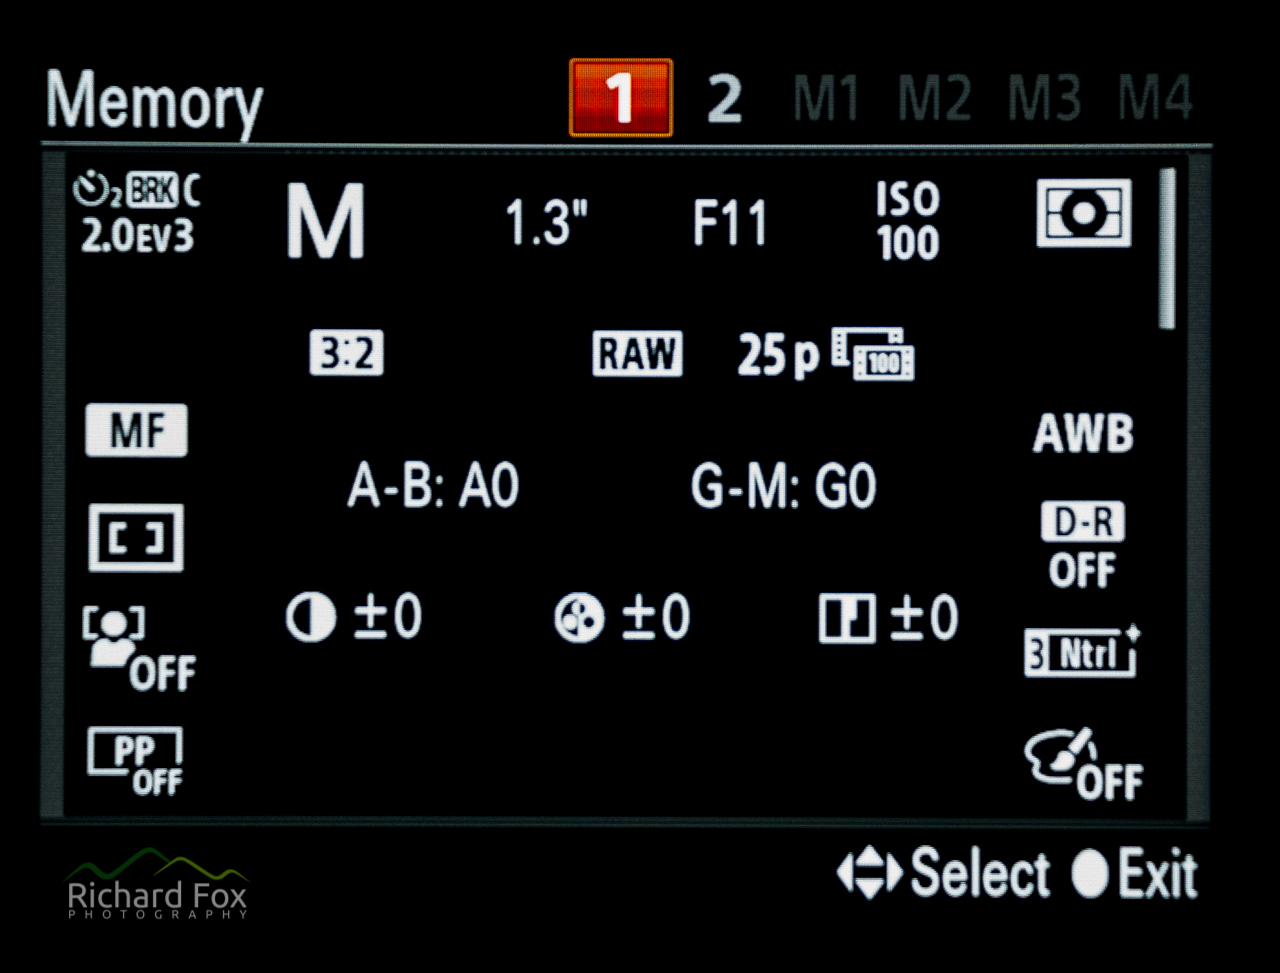 A7RM2 memory screen